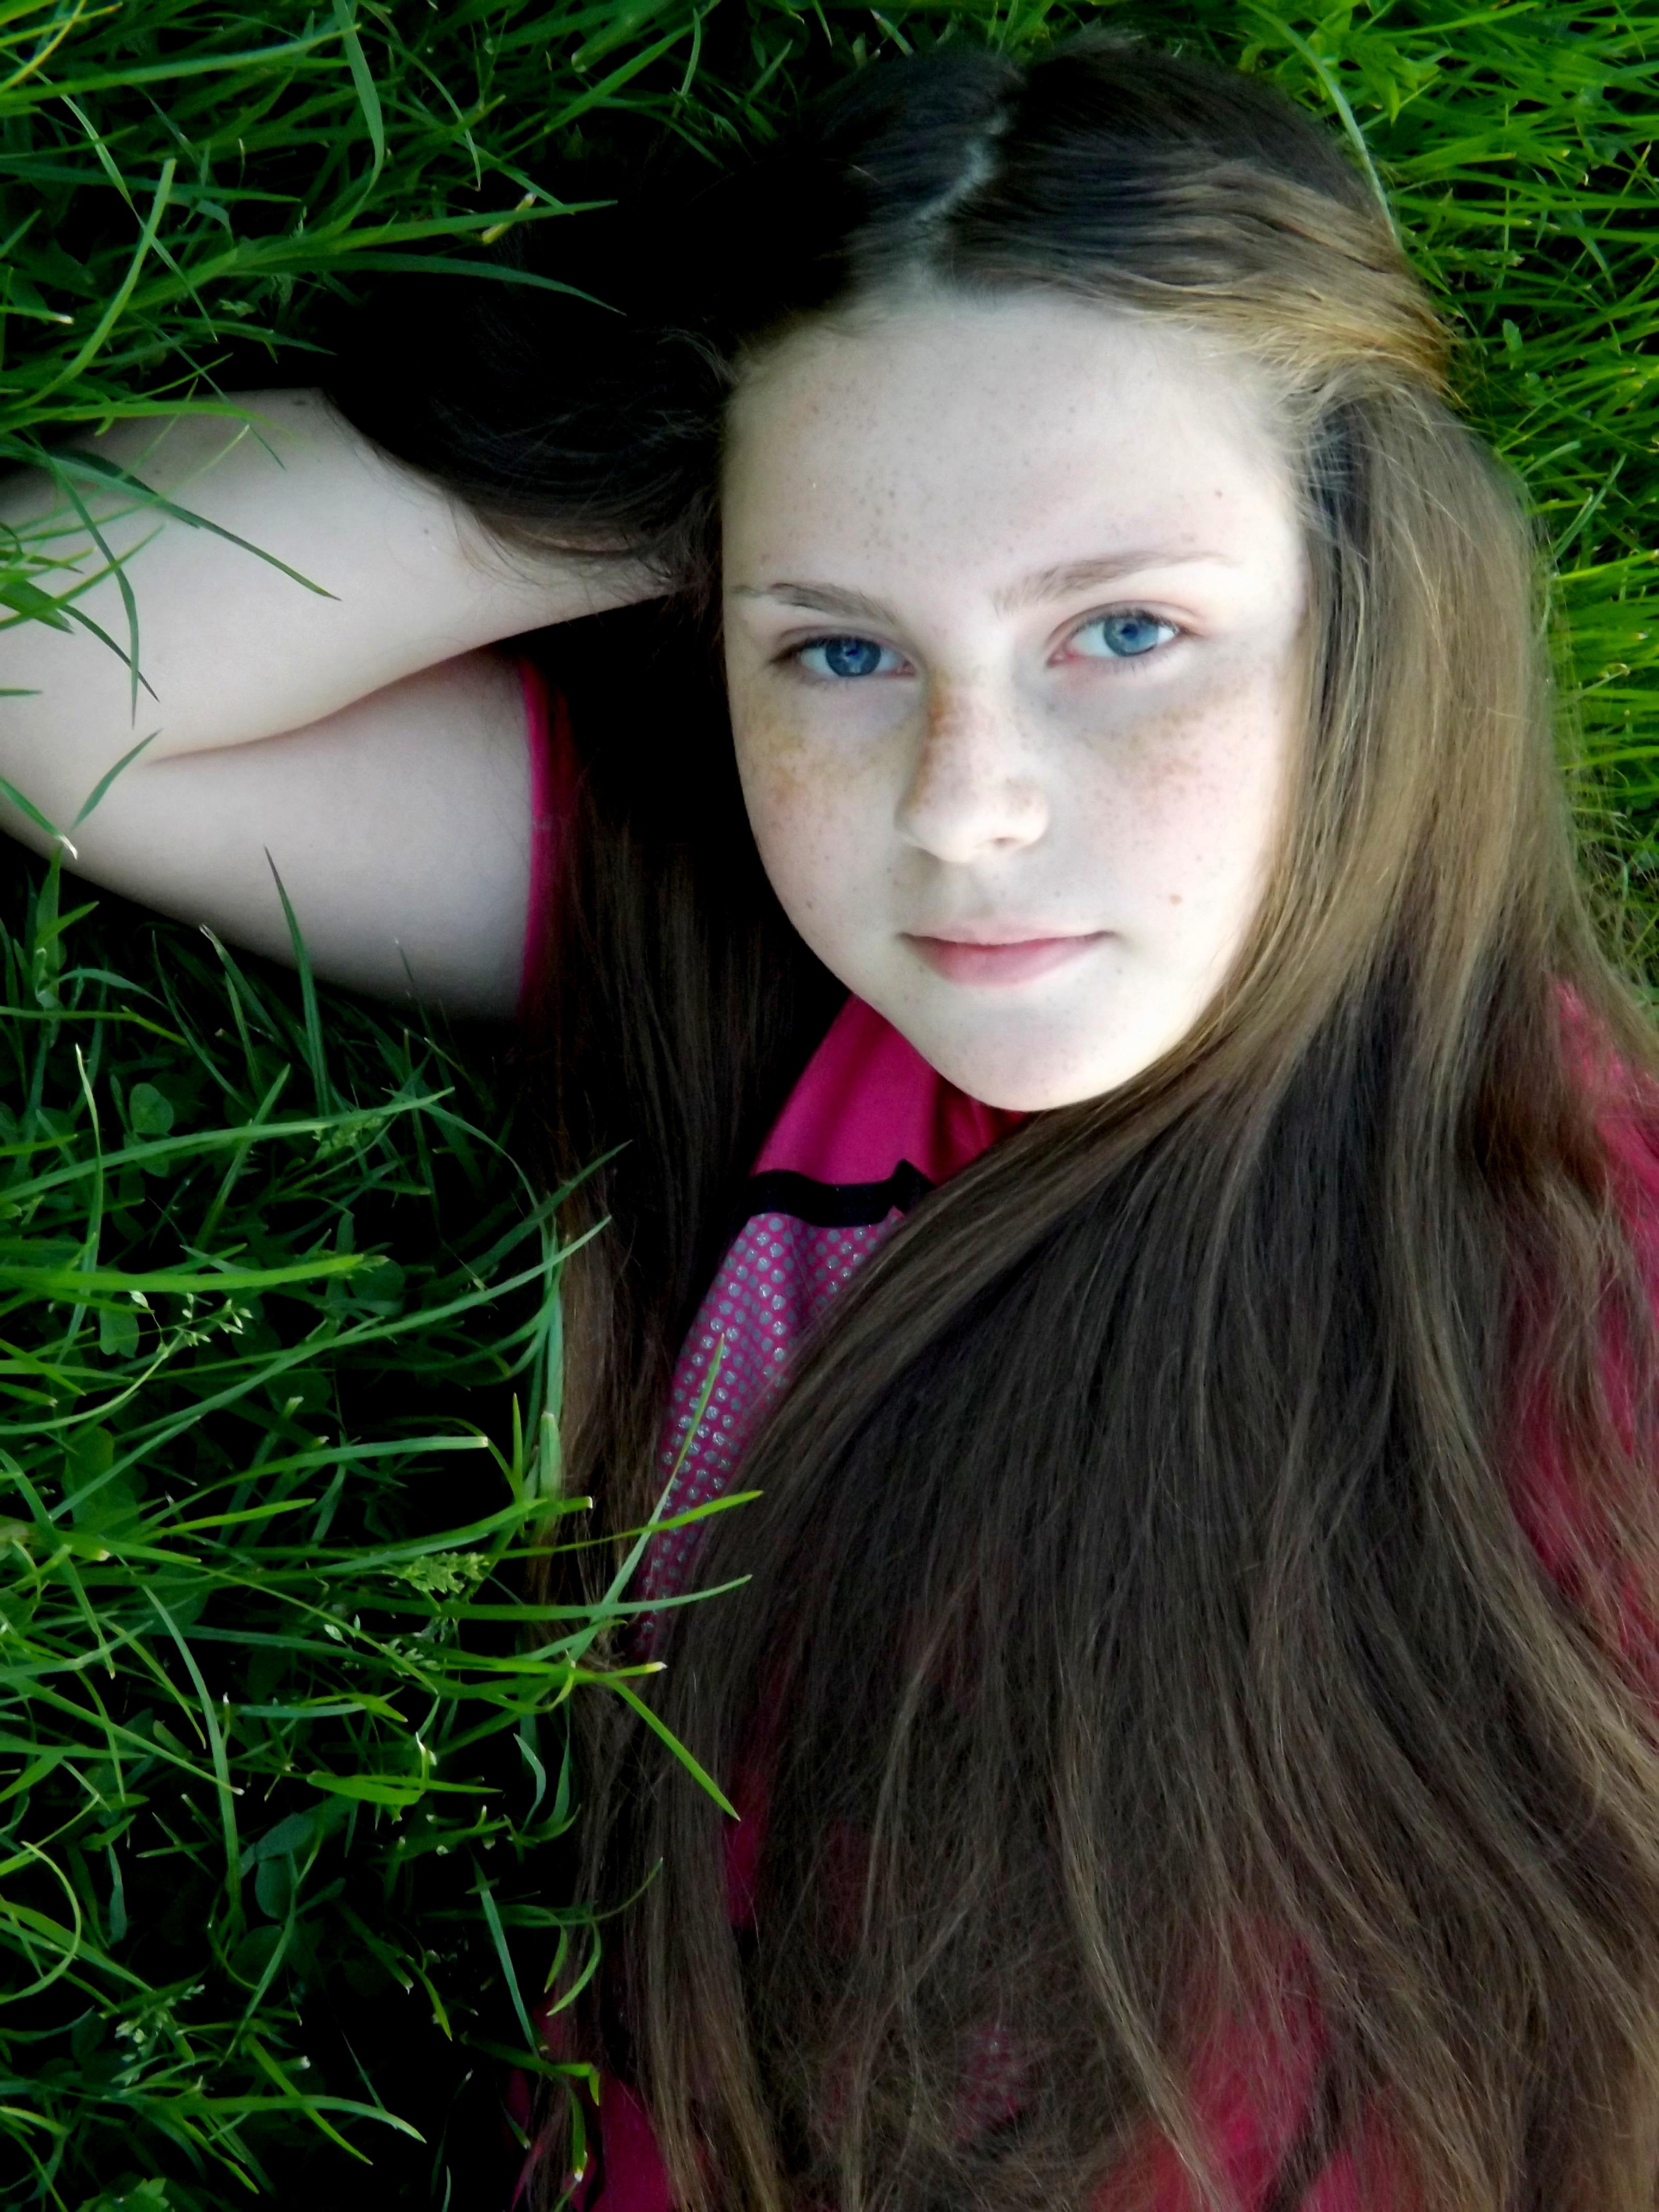 Braune haare sommersprossen Die 10